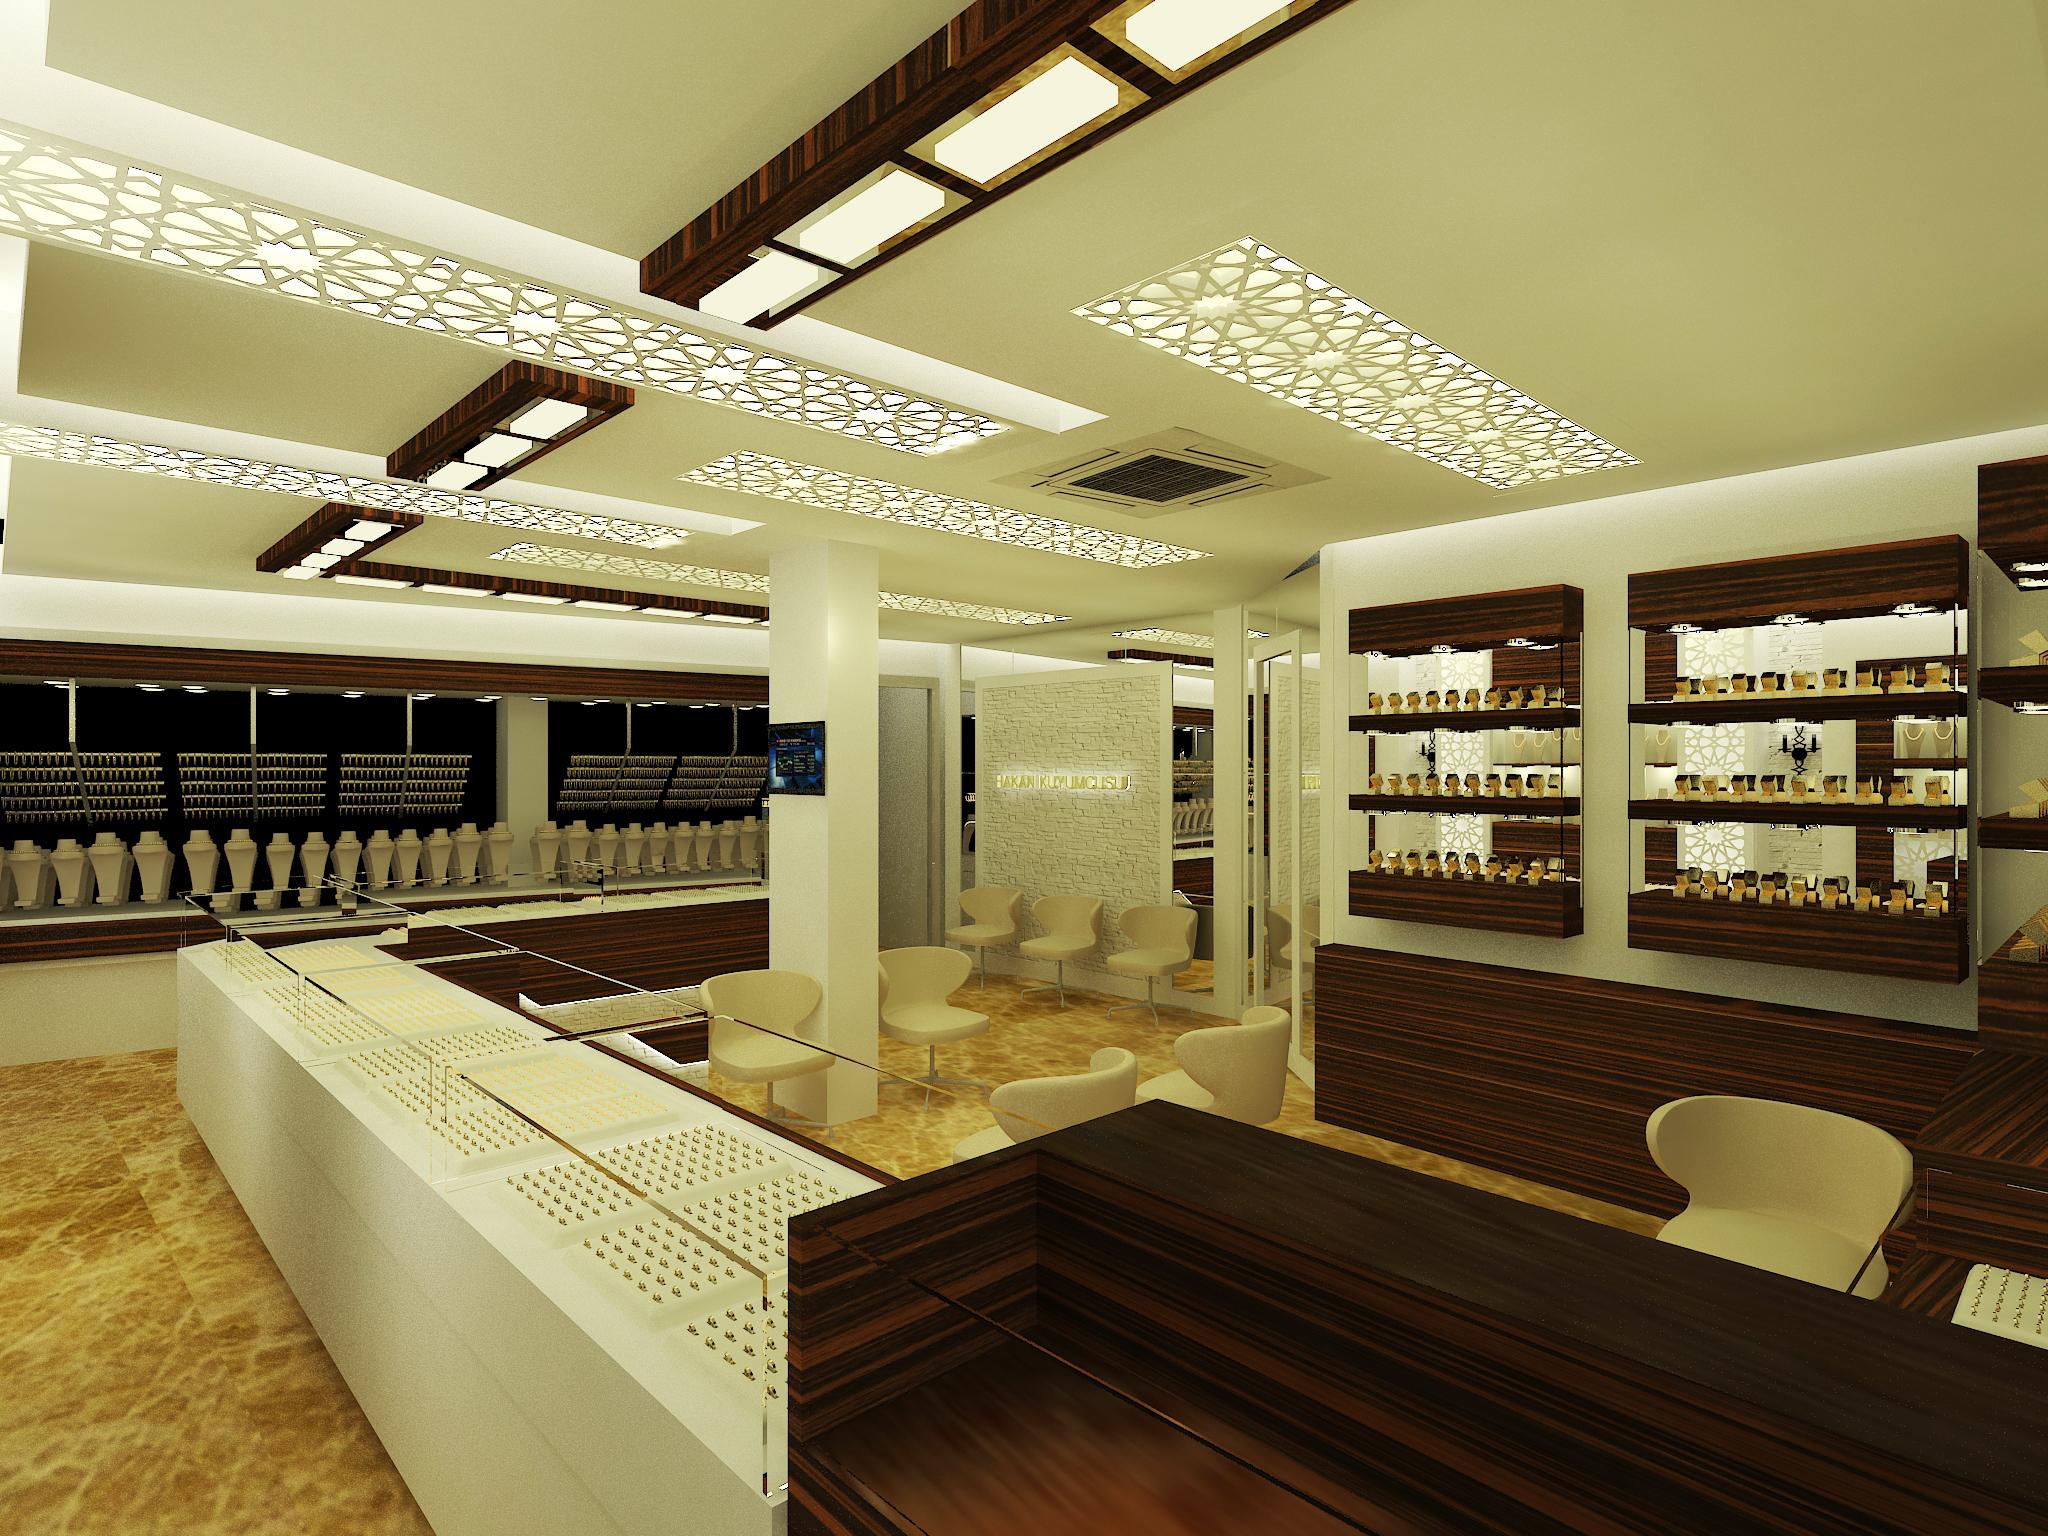 Hakan kuyumculuk, kuyumcu mağaza tasarımları (2)